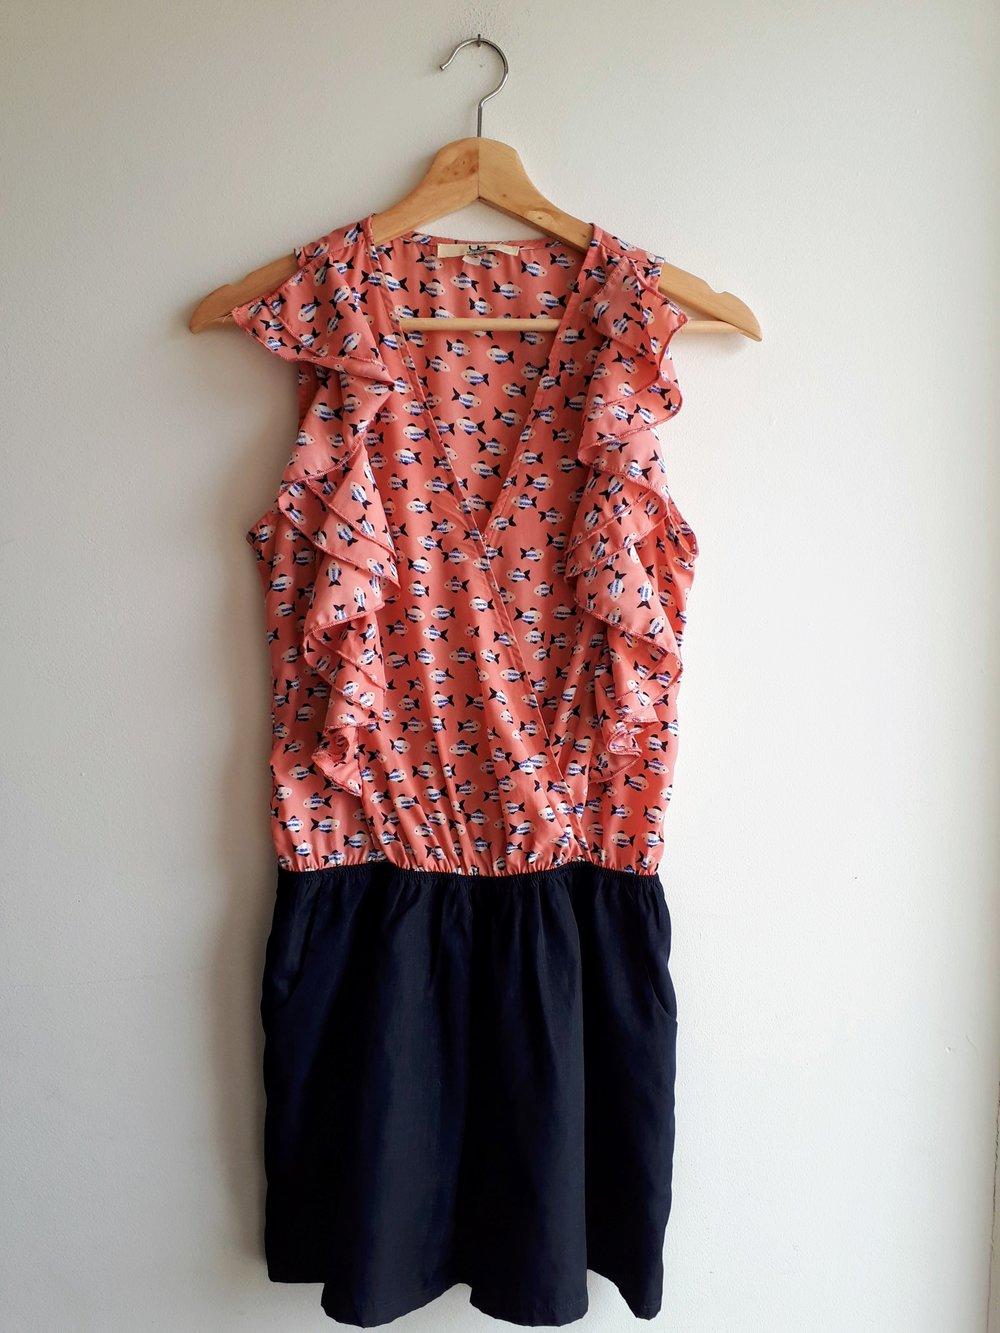 Ya dress; Size S, $26